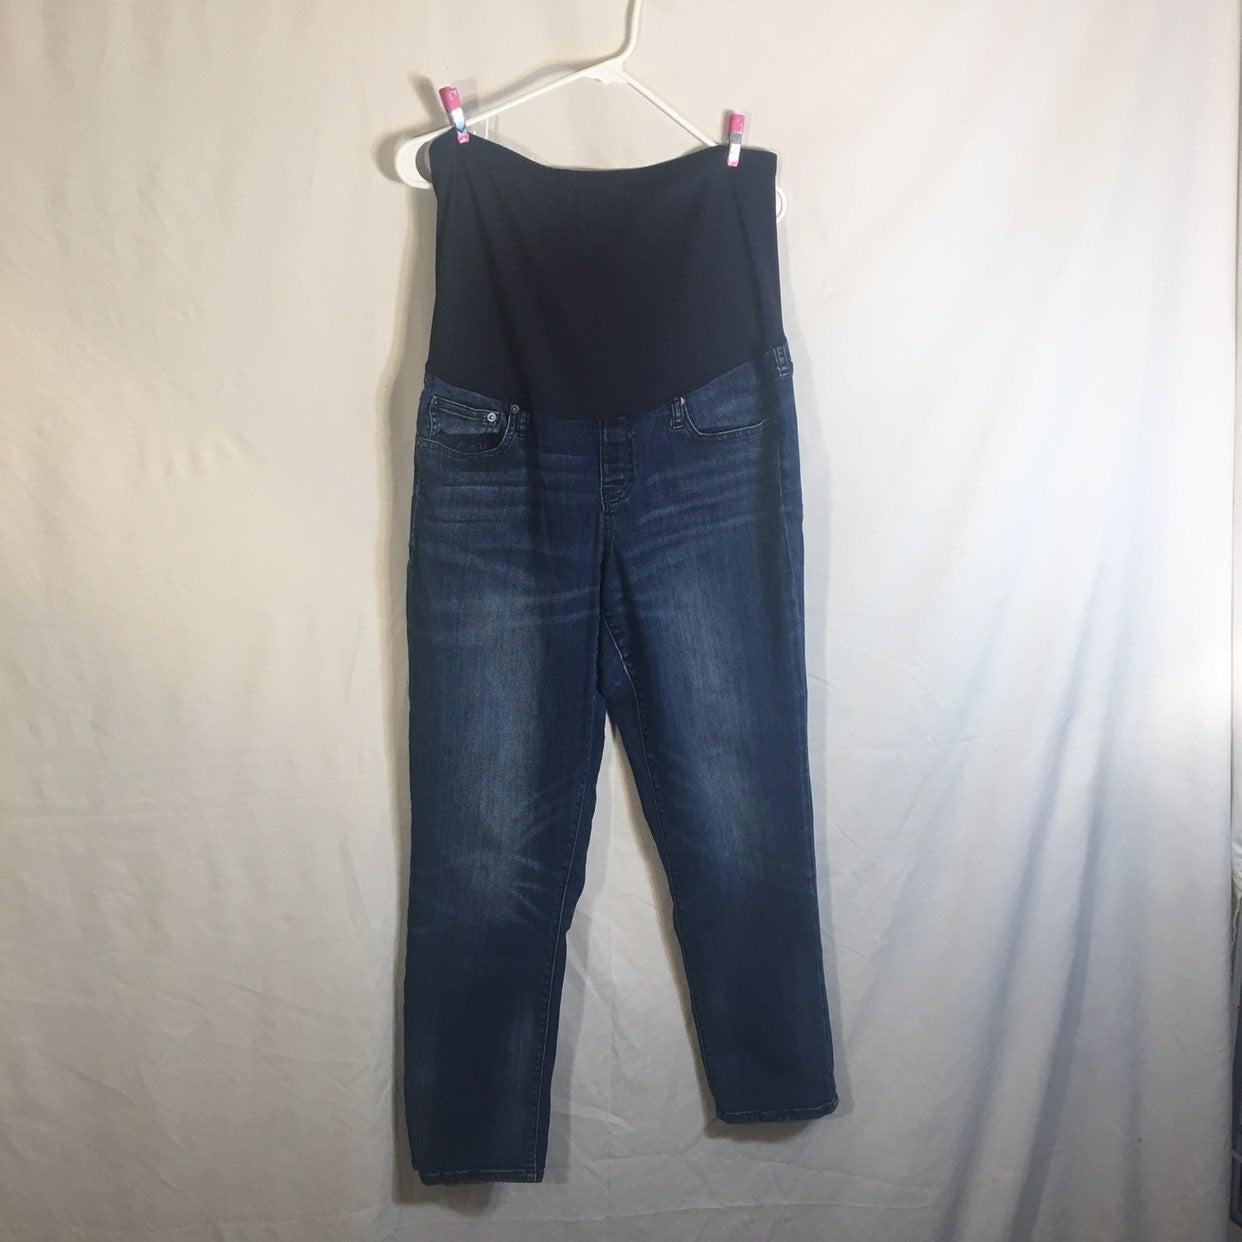 Gap Maternity Jeans! Size 32R